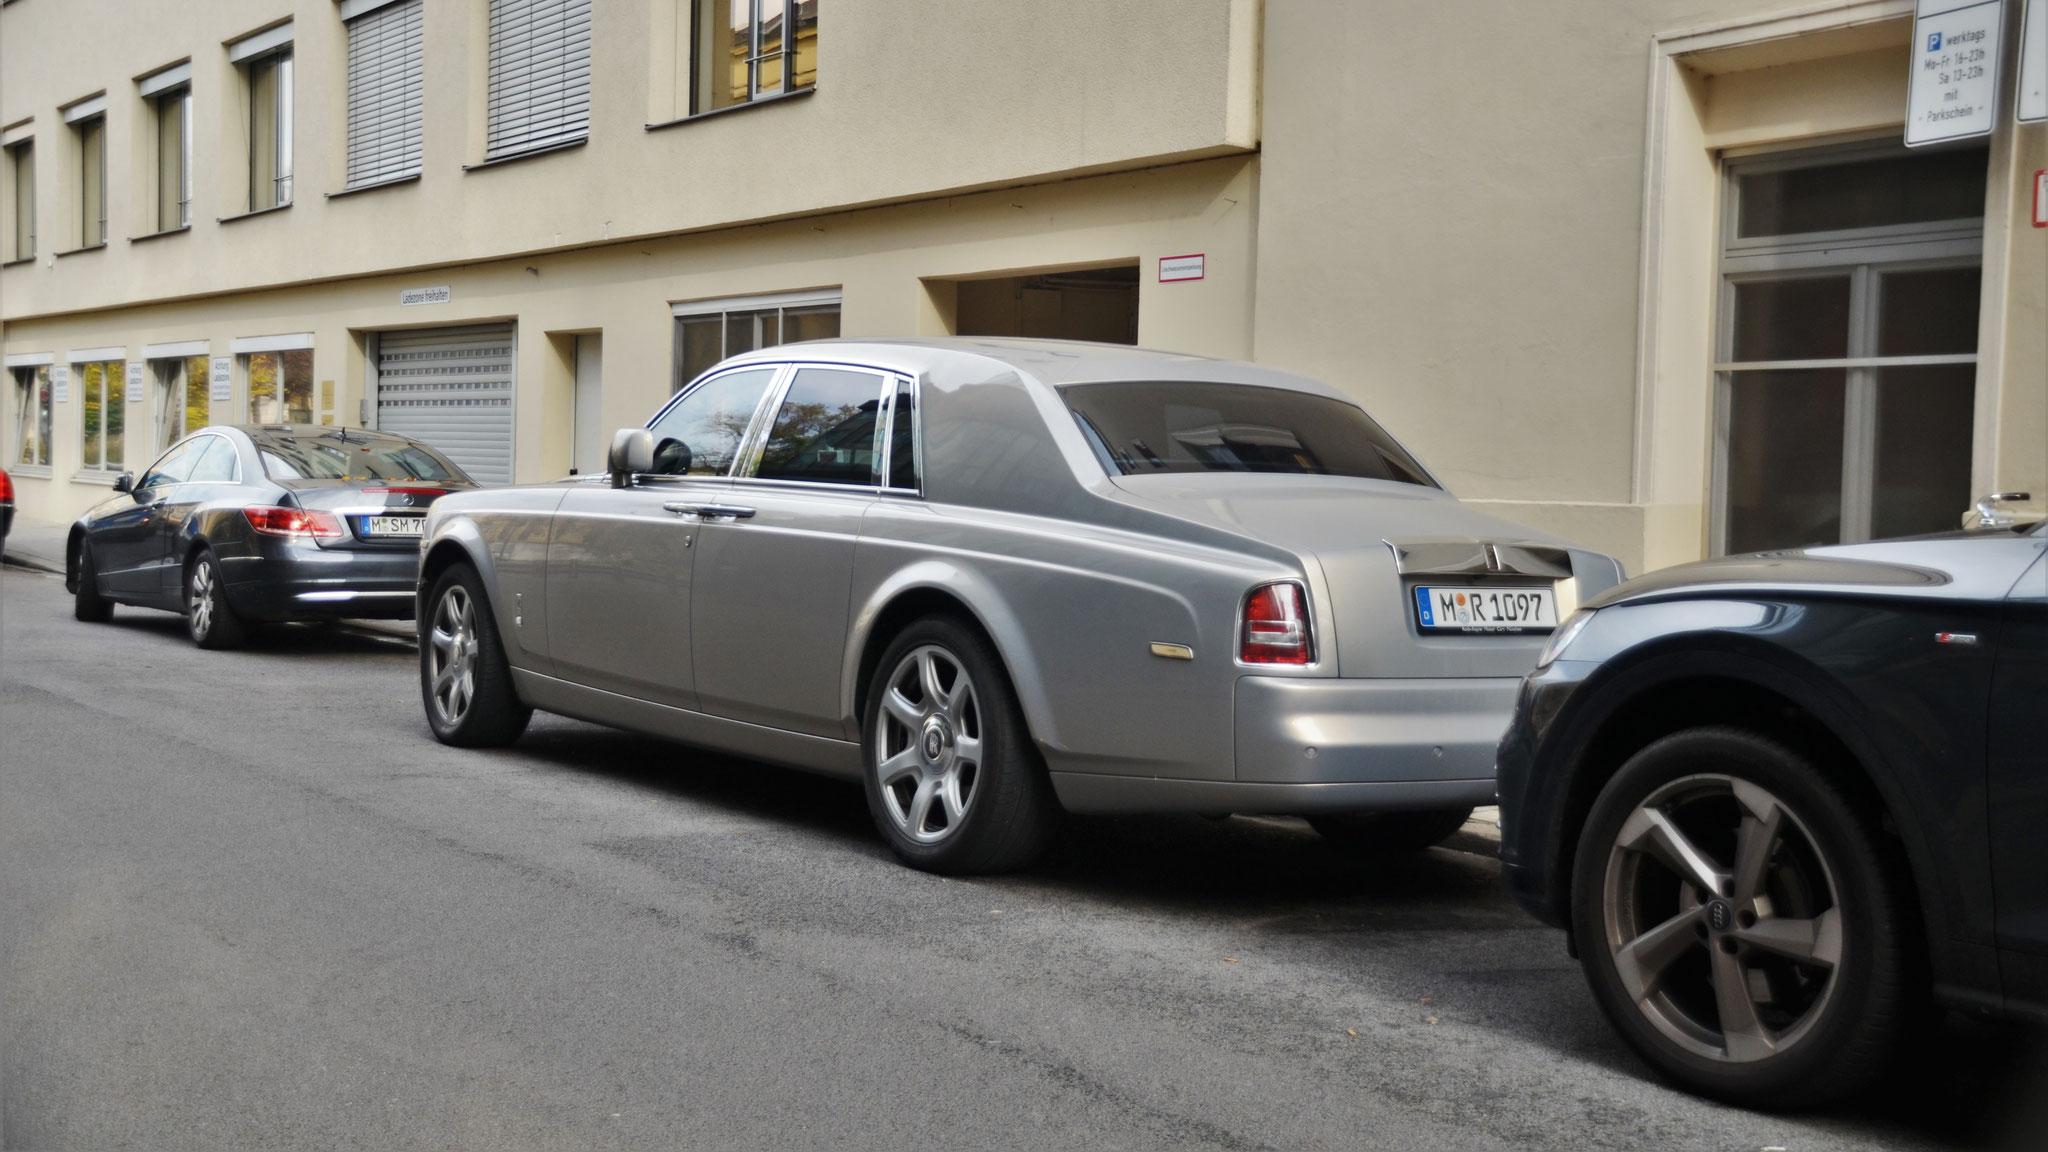 Rolls Royce Phantom - M-R-1097